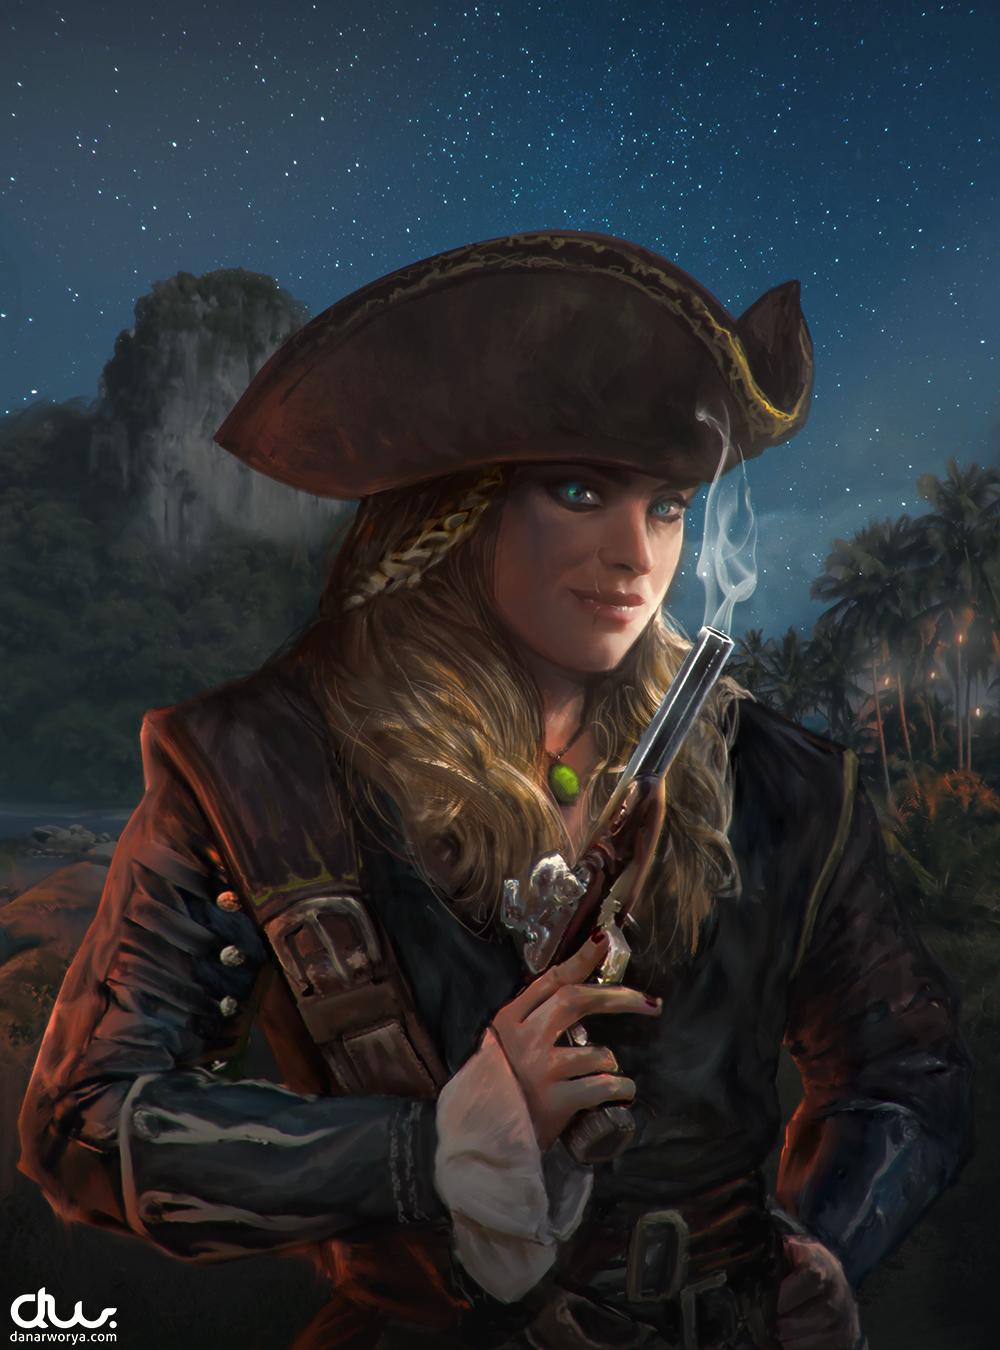 Pirate Girl by DanarArt